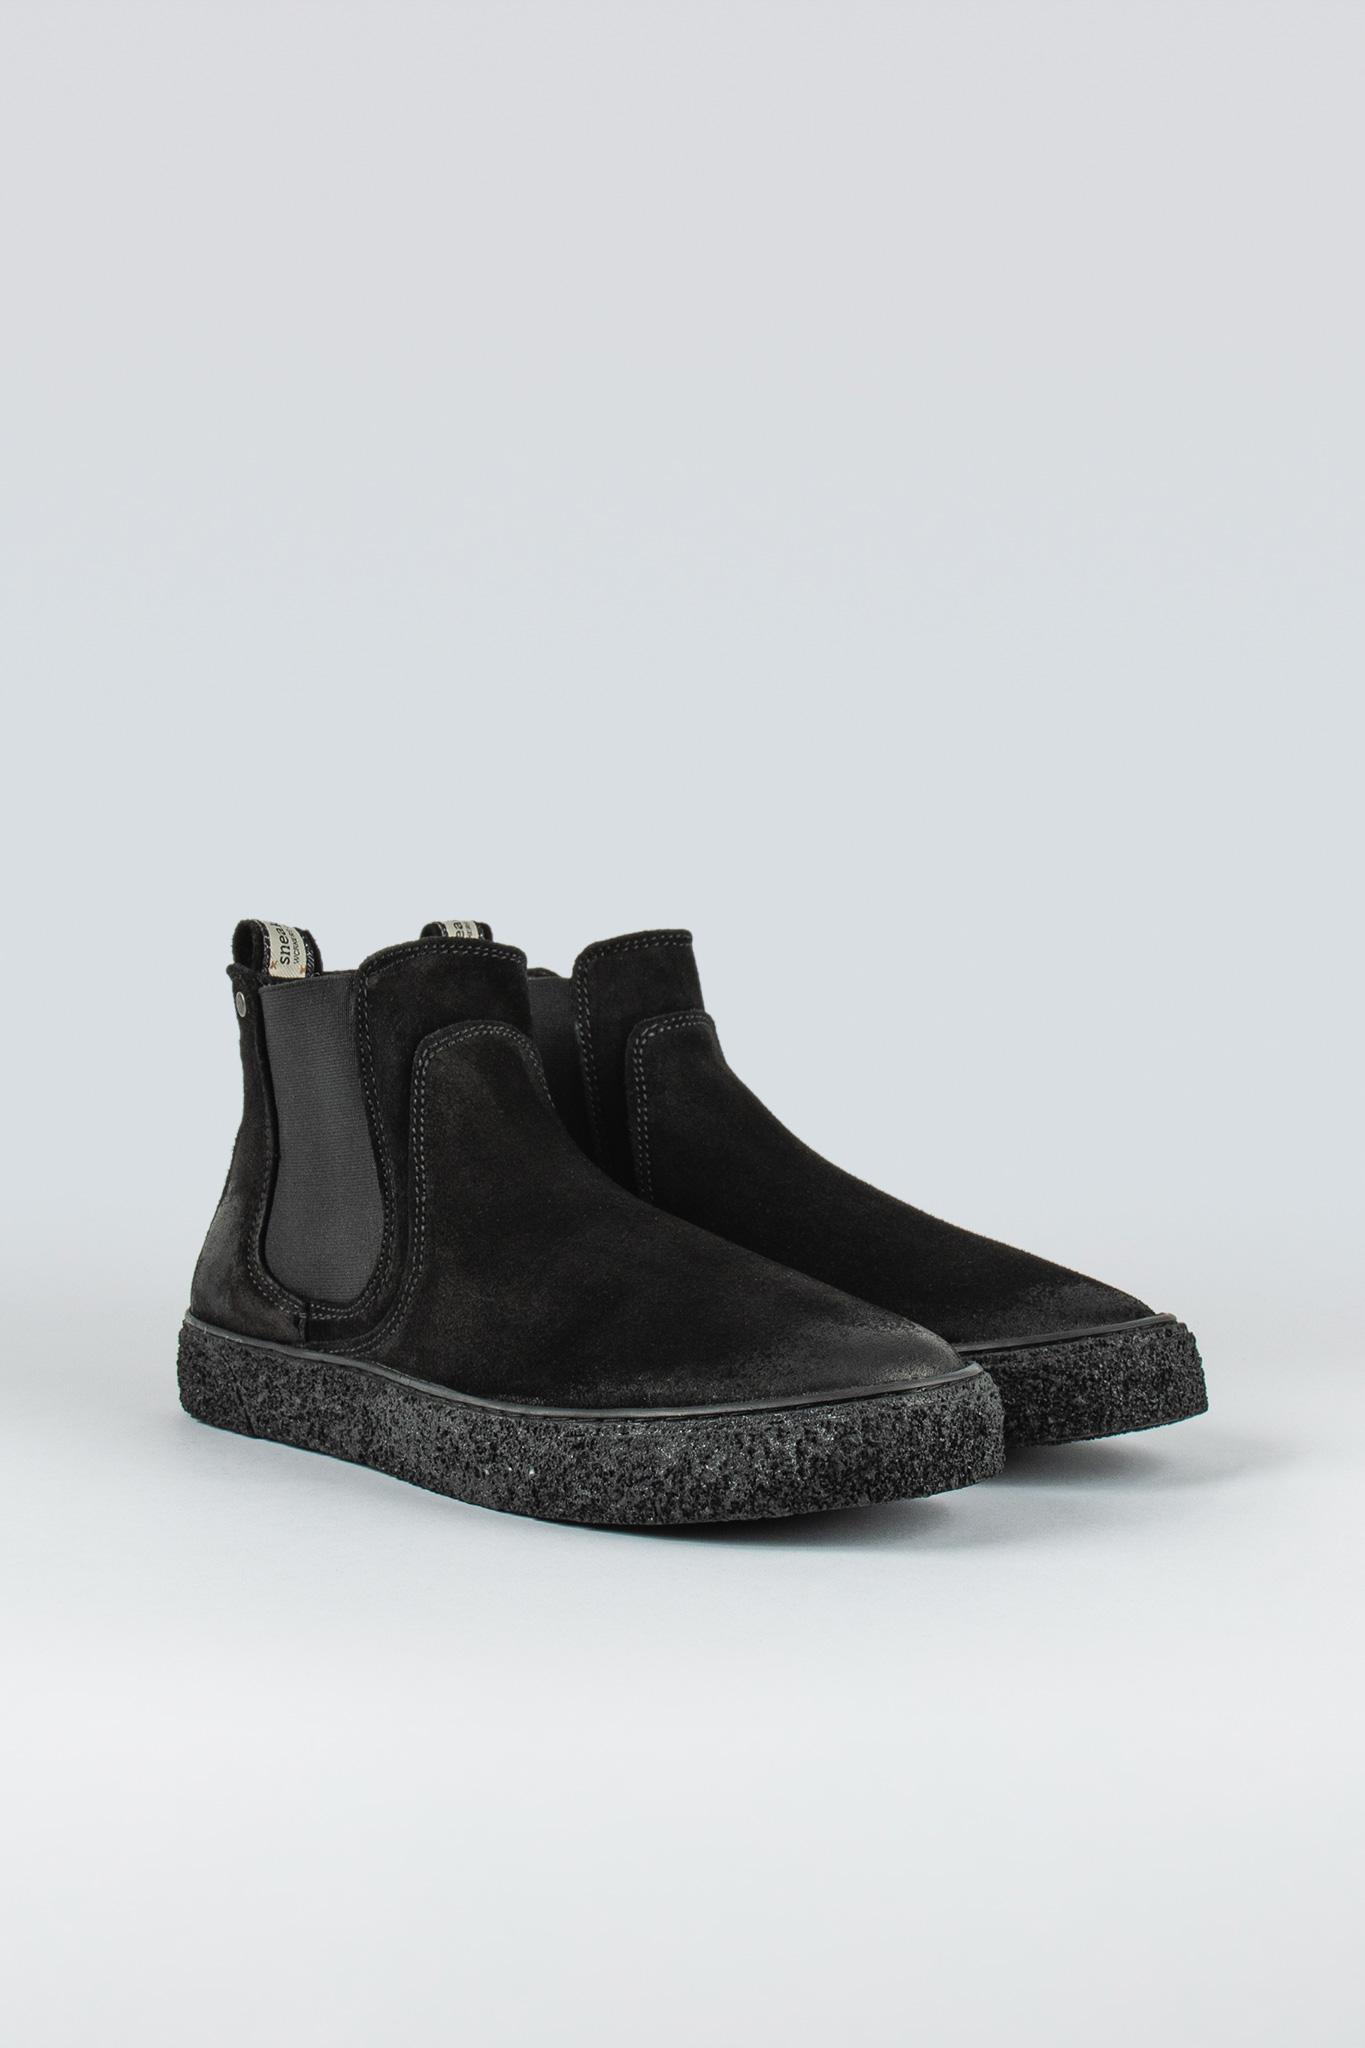 Style: Sluggish Black Suede